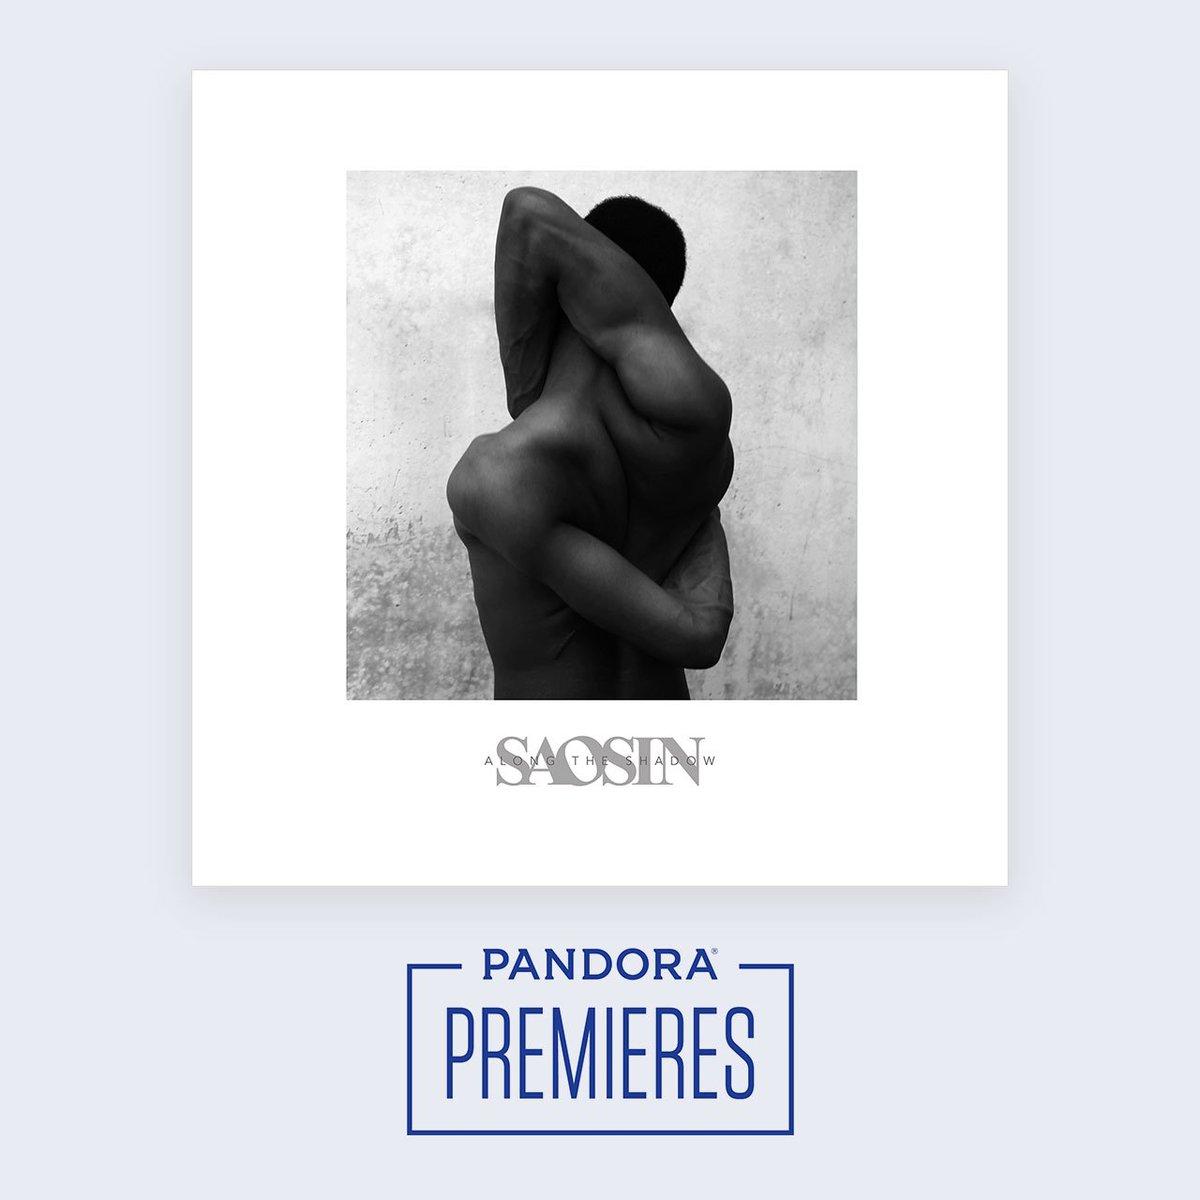 Tomorrow, we'll be streaming #AlongTheShadow on @Pandora_Radio! #PandoraPremieres https://t.co/9Zulsc2oea